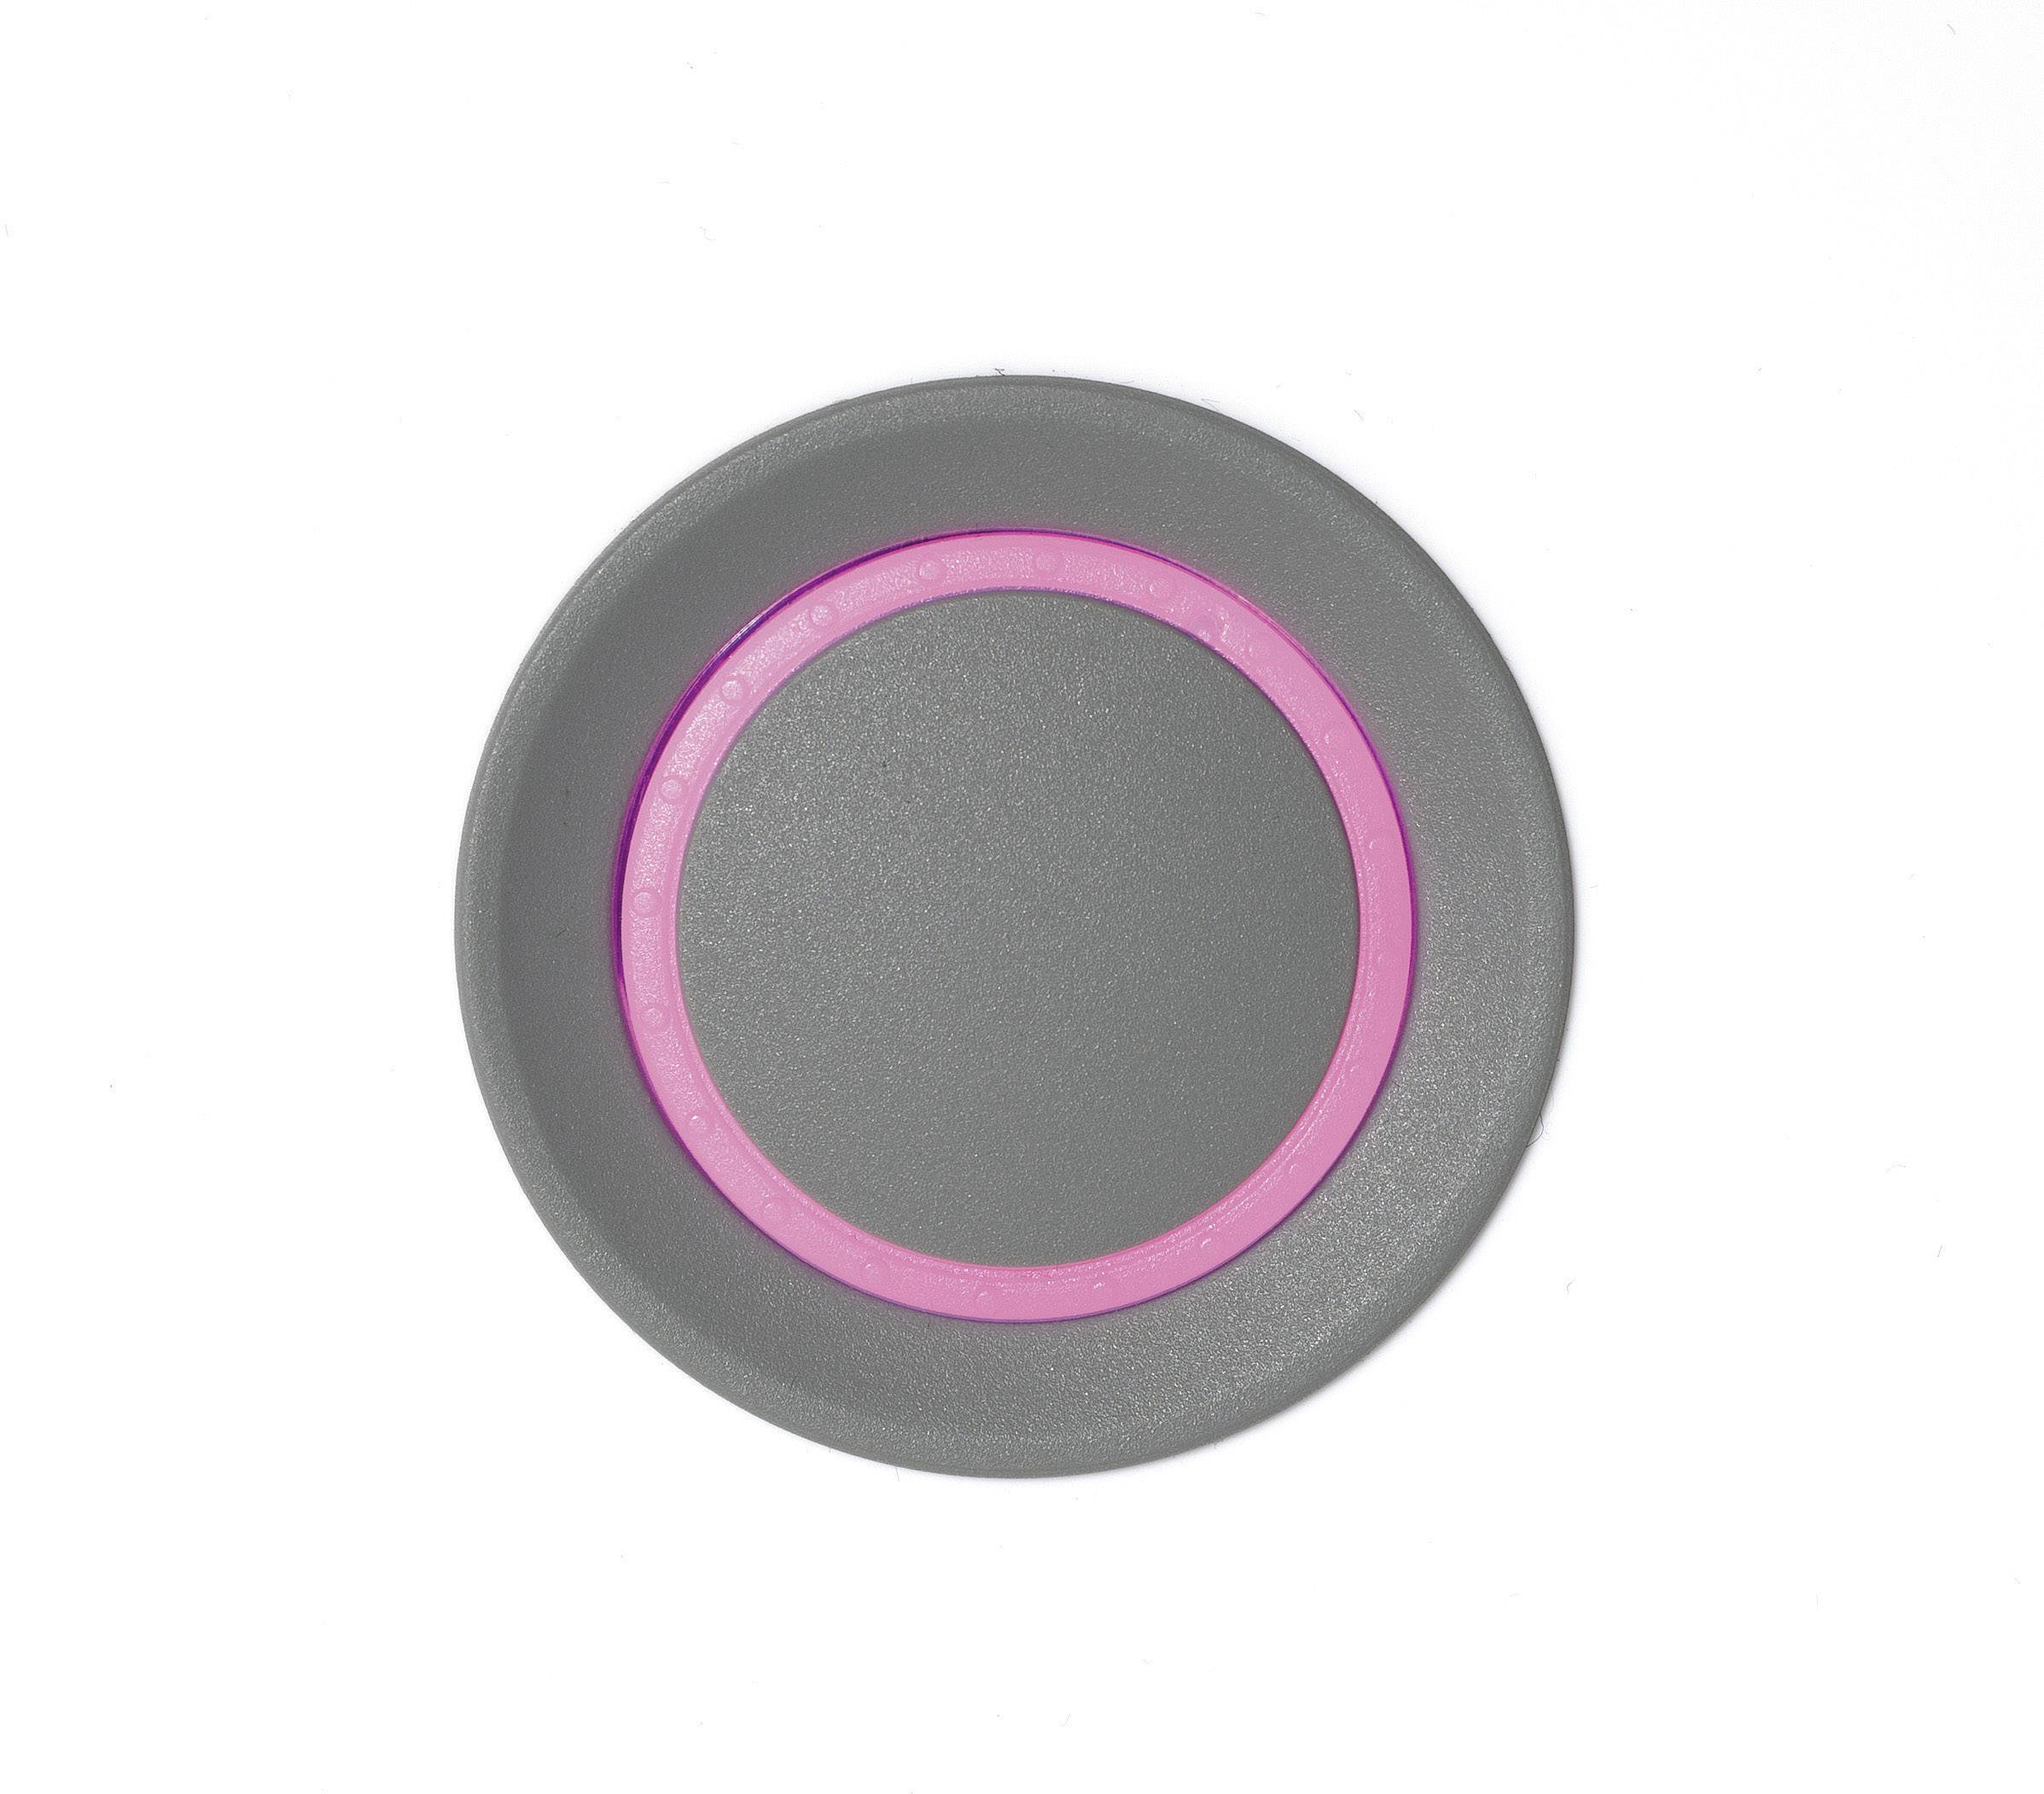 Otočný gombík OKW D8733028, (Ø x v) 33 mm x 26 mm, vulkán, 1 ks